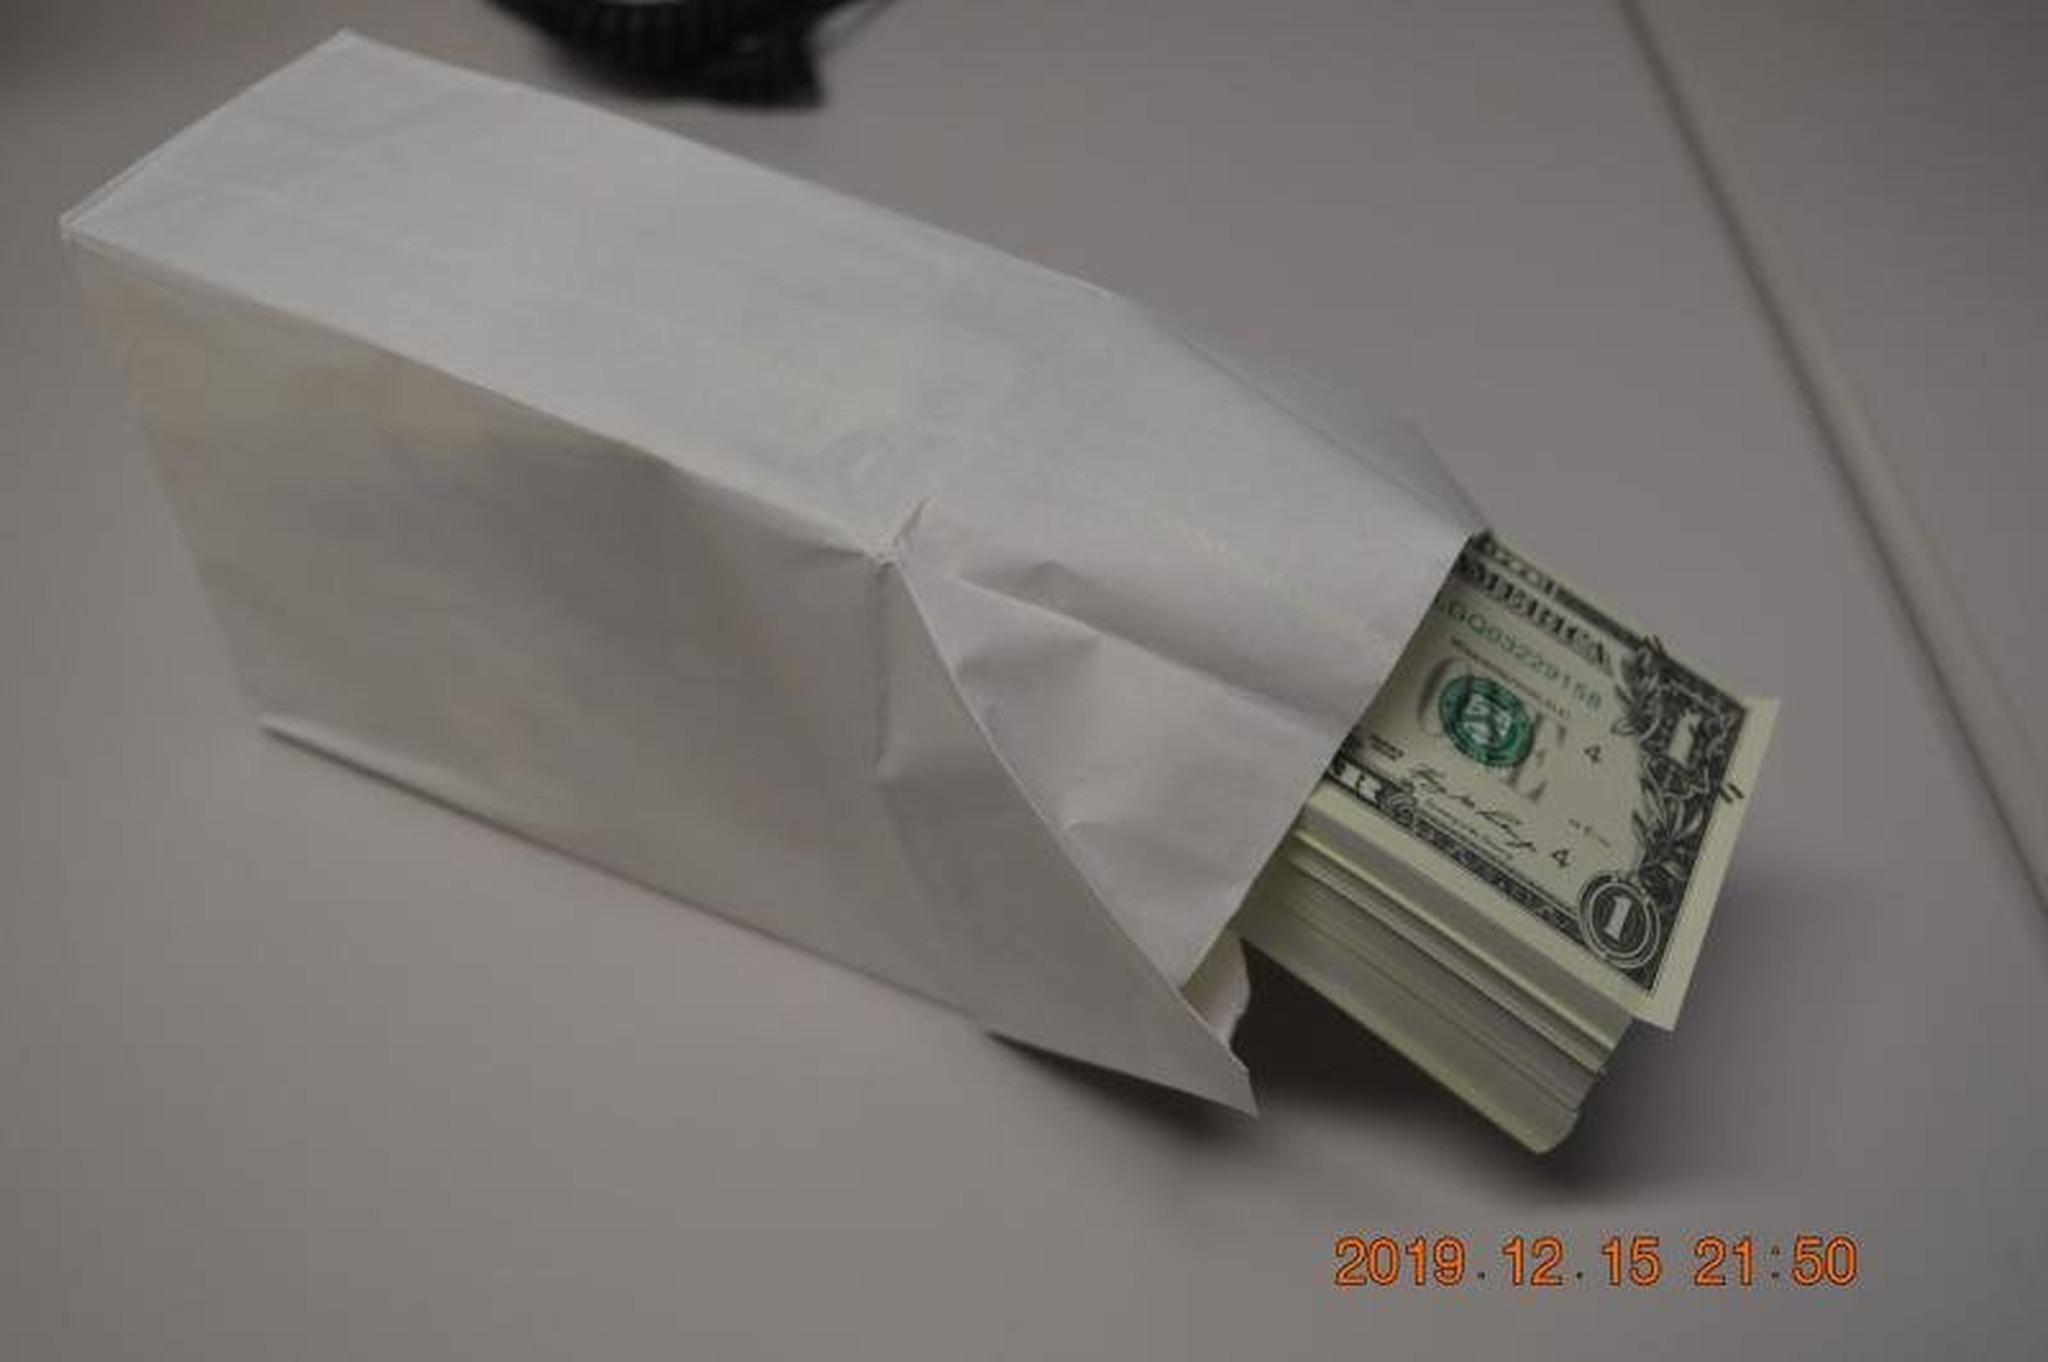 $900K worth of counterfeit money seized in Minnesota